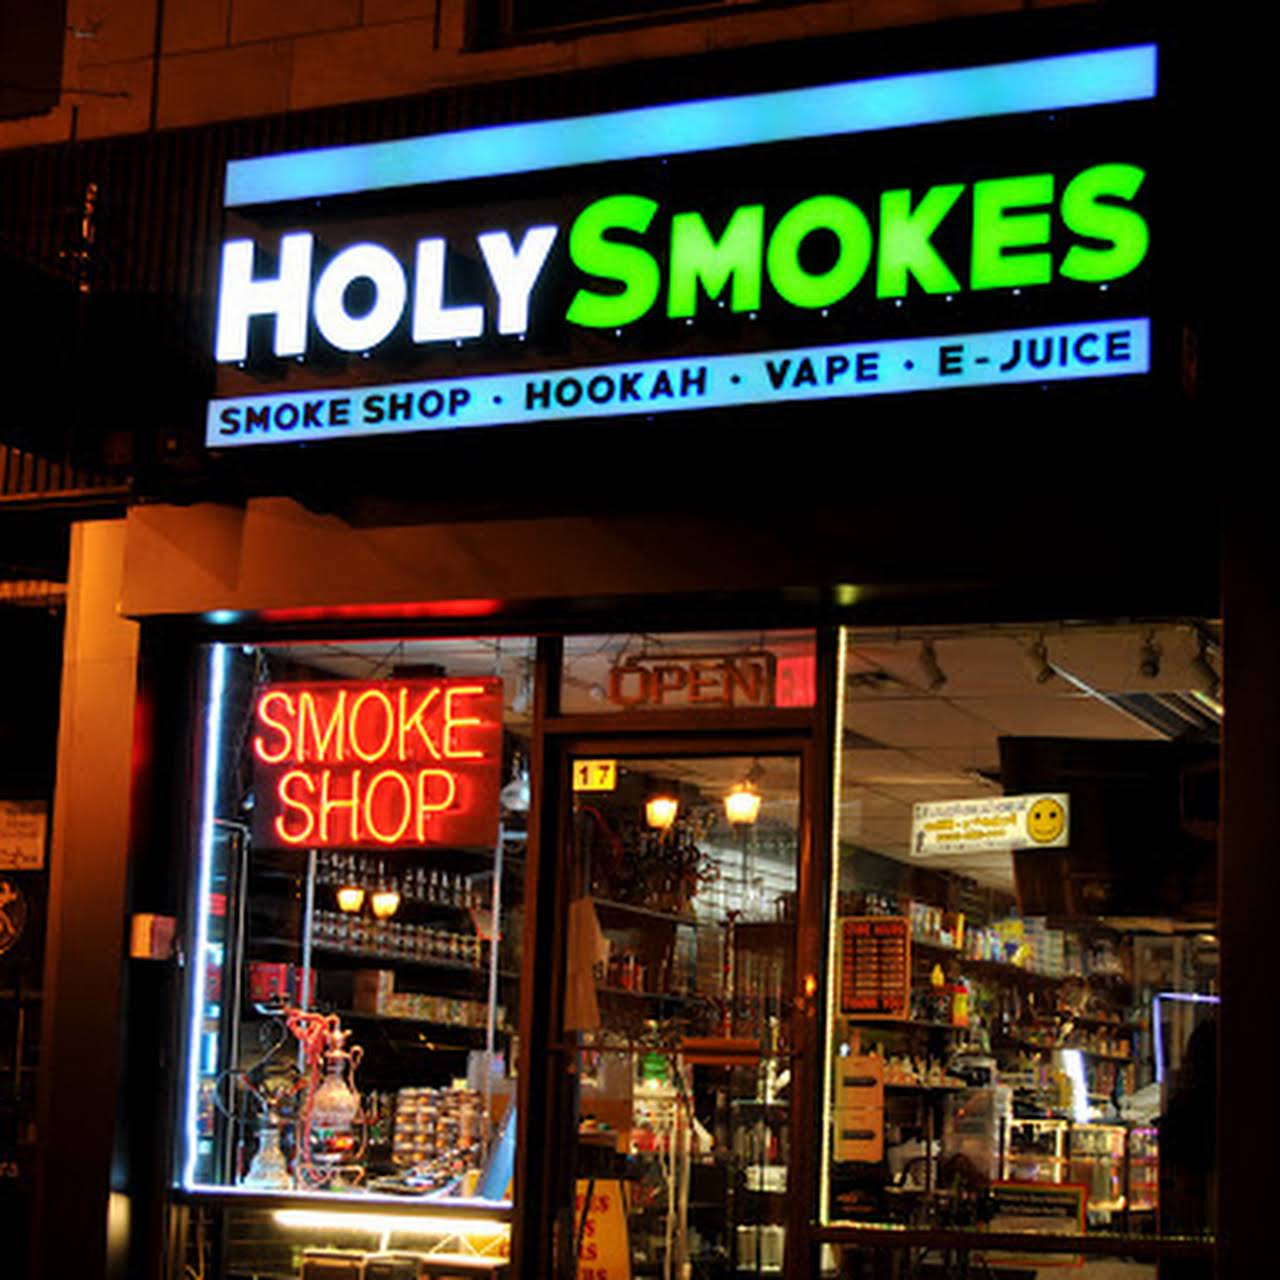 Holy Smokes NJ - Tobacco vape Shop in Elizabeth NJ